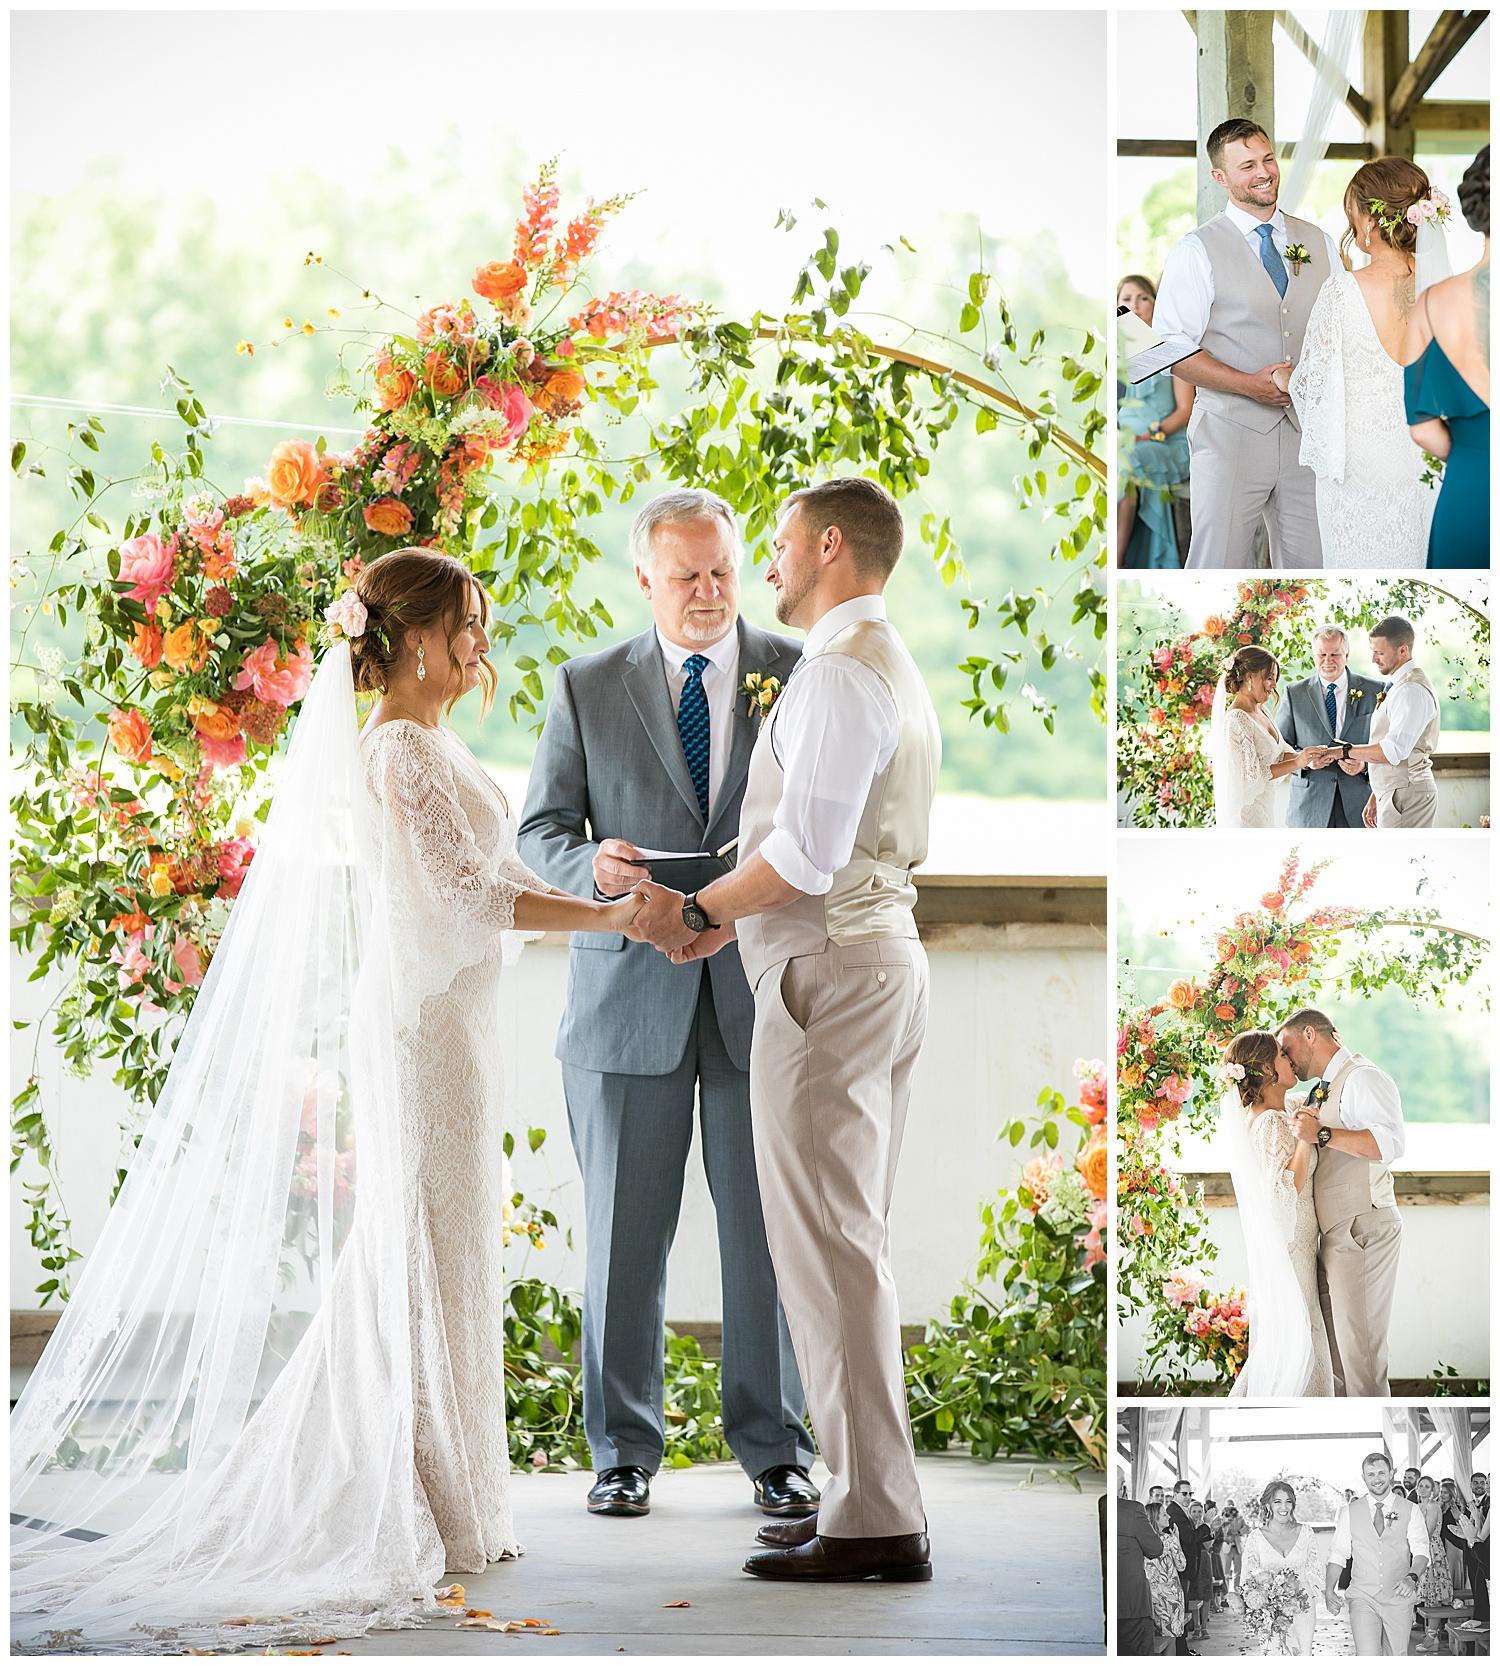 Valley View Farm Wedding - Ceremony